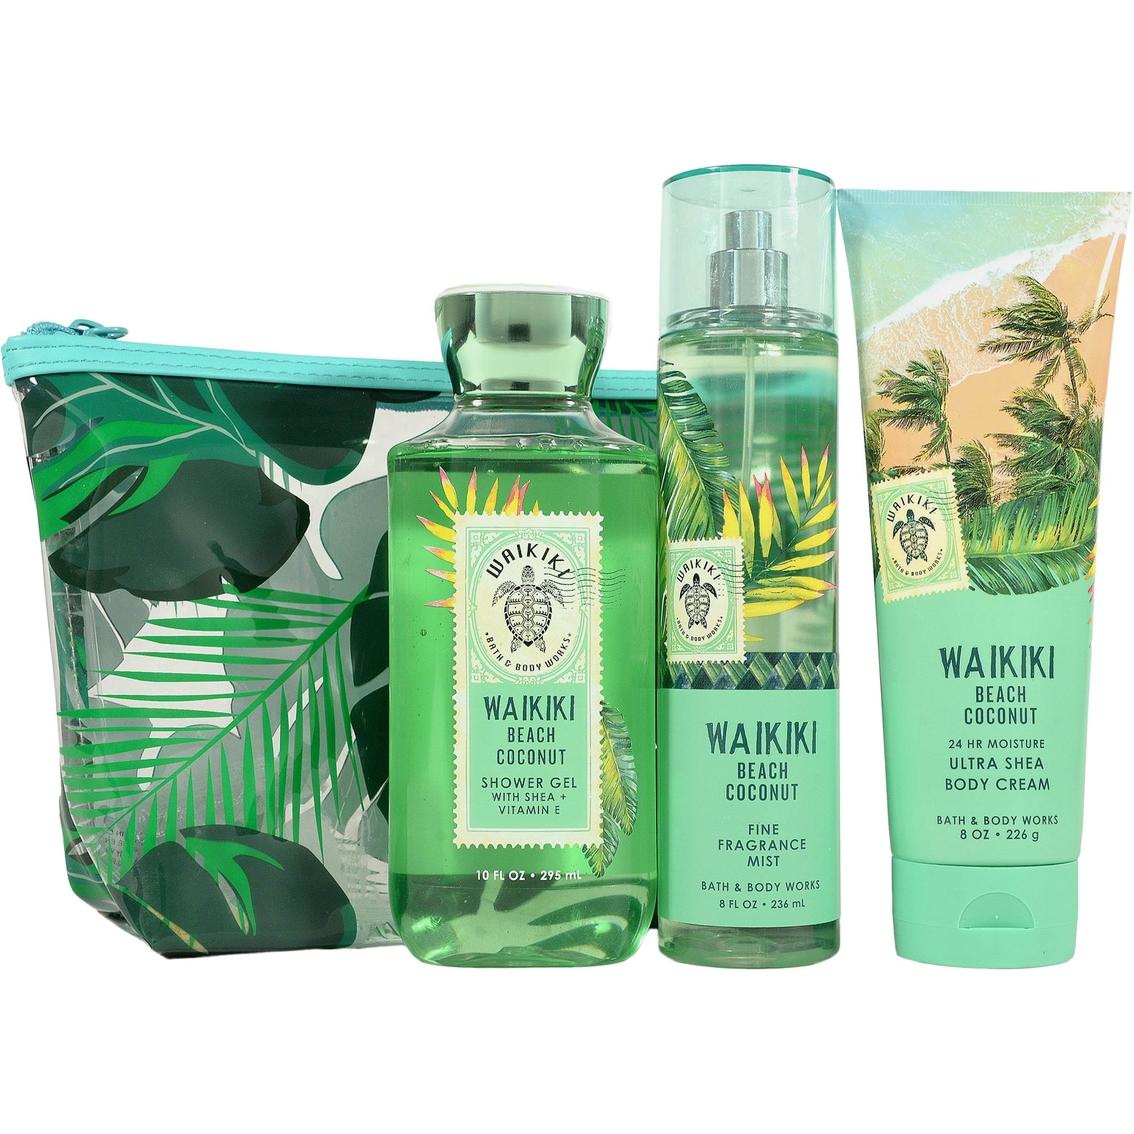 Bath Body Works Waikiki Beach Coconut Adventure Awaits 3